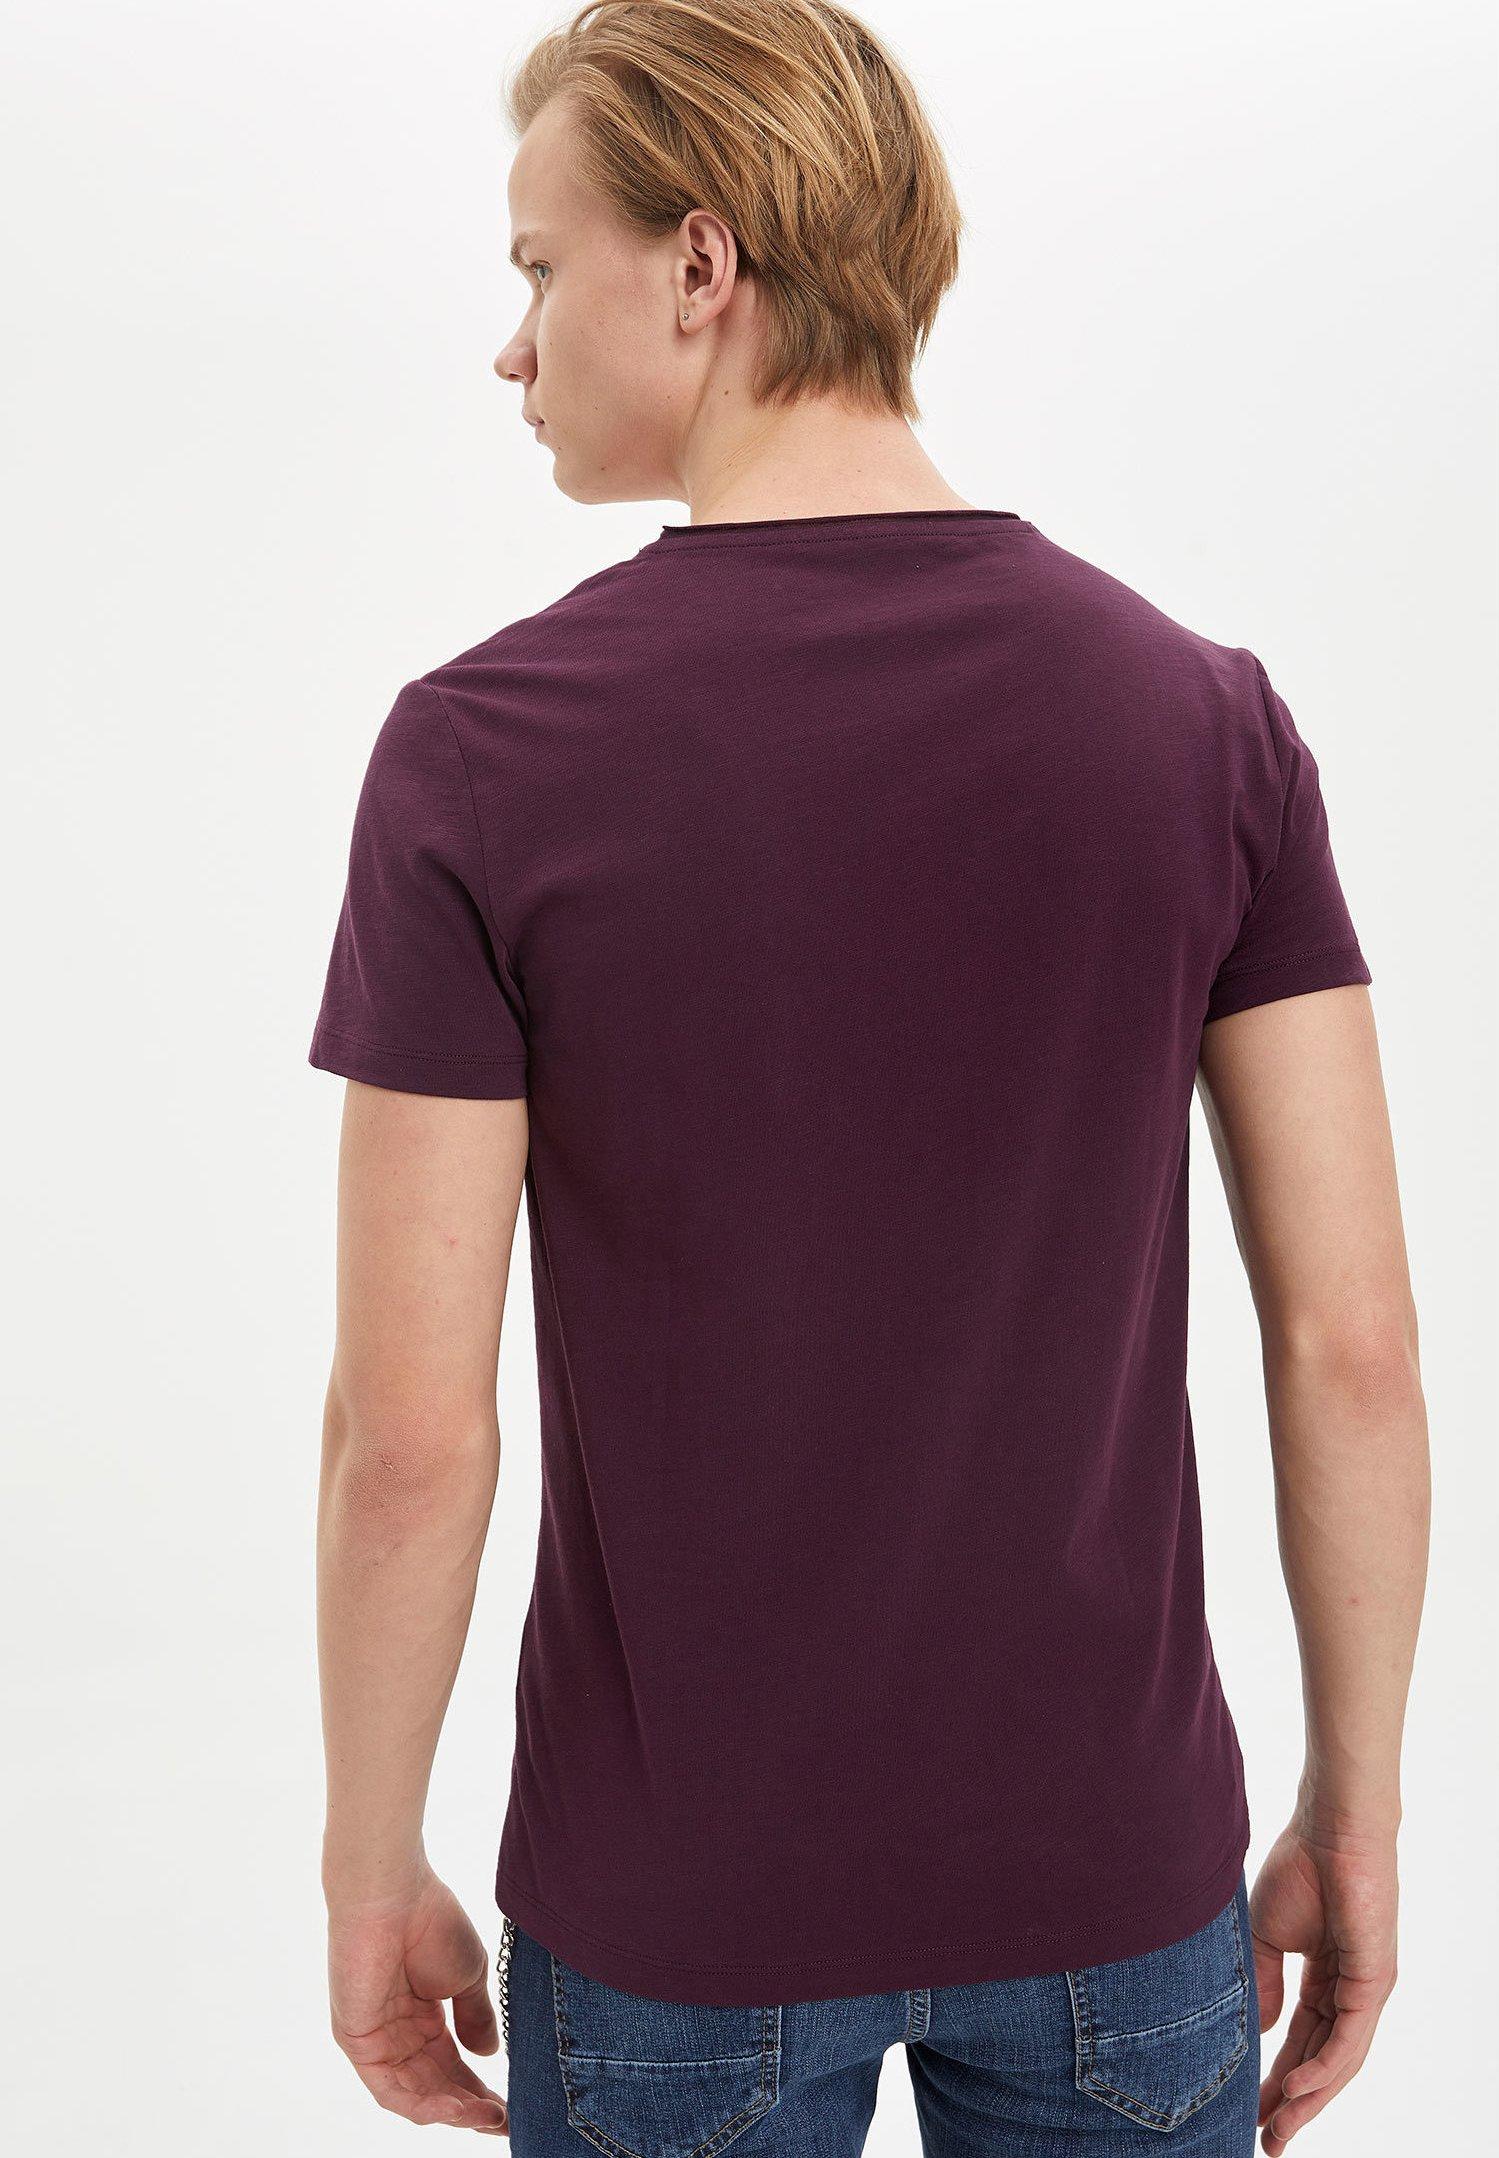 DeFacto Basic T-shirt - purple G9Y0m